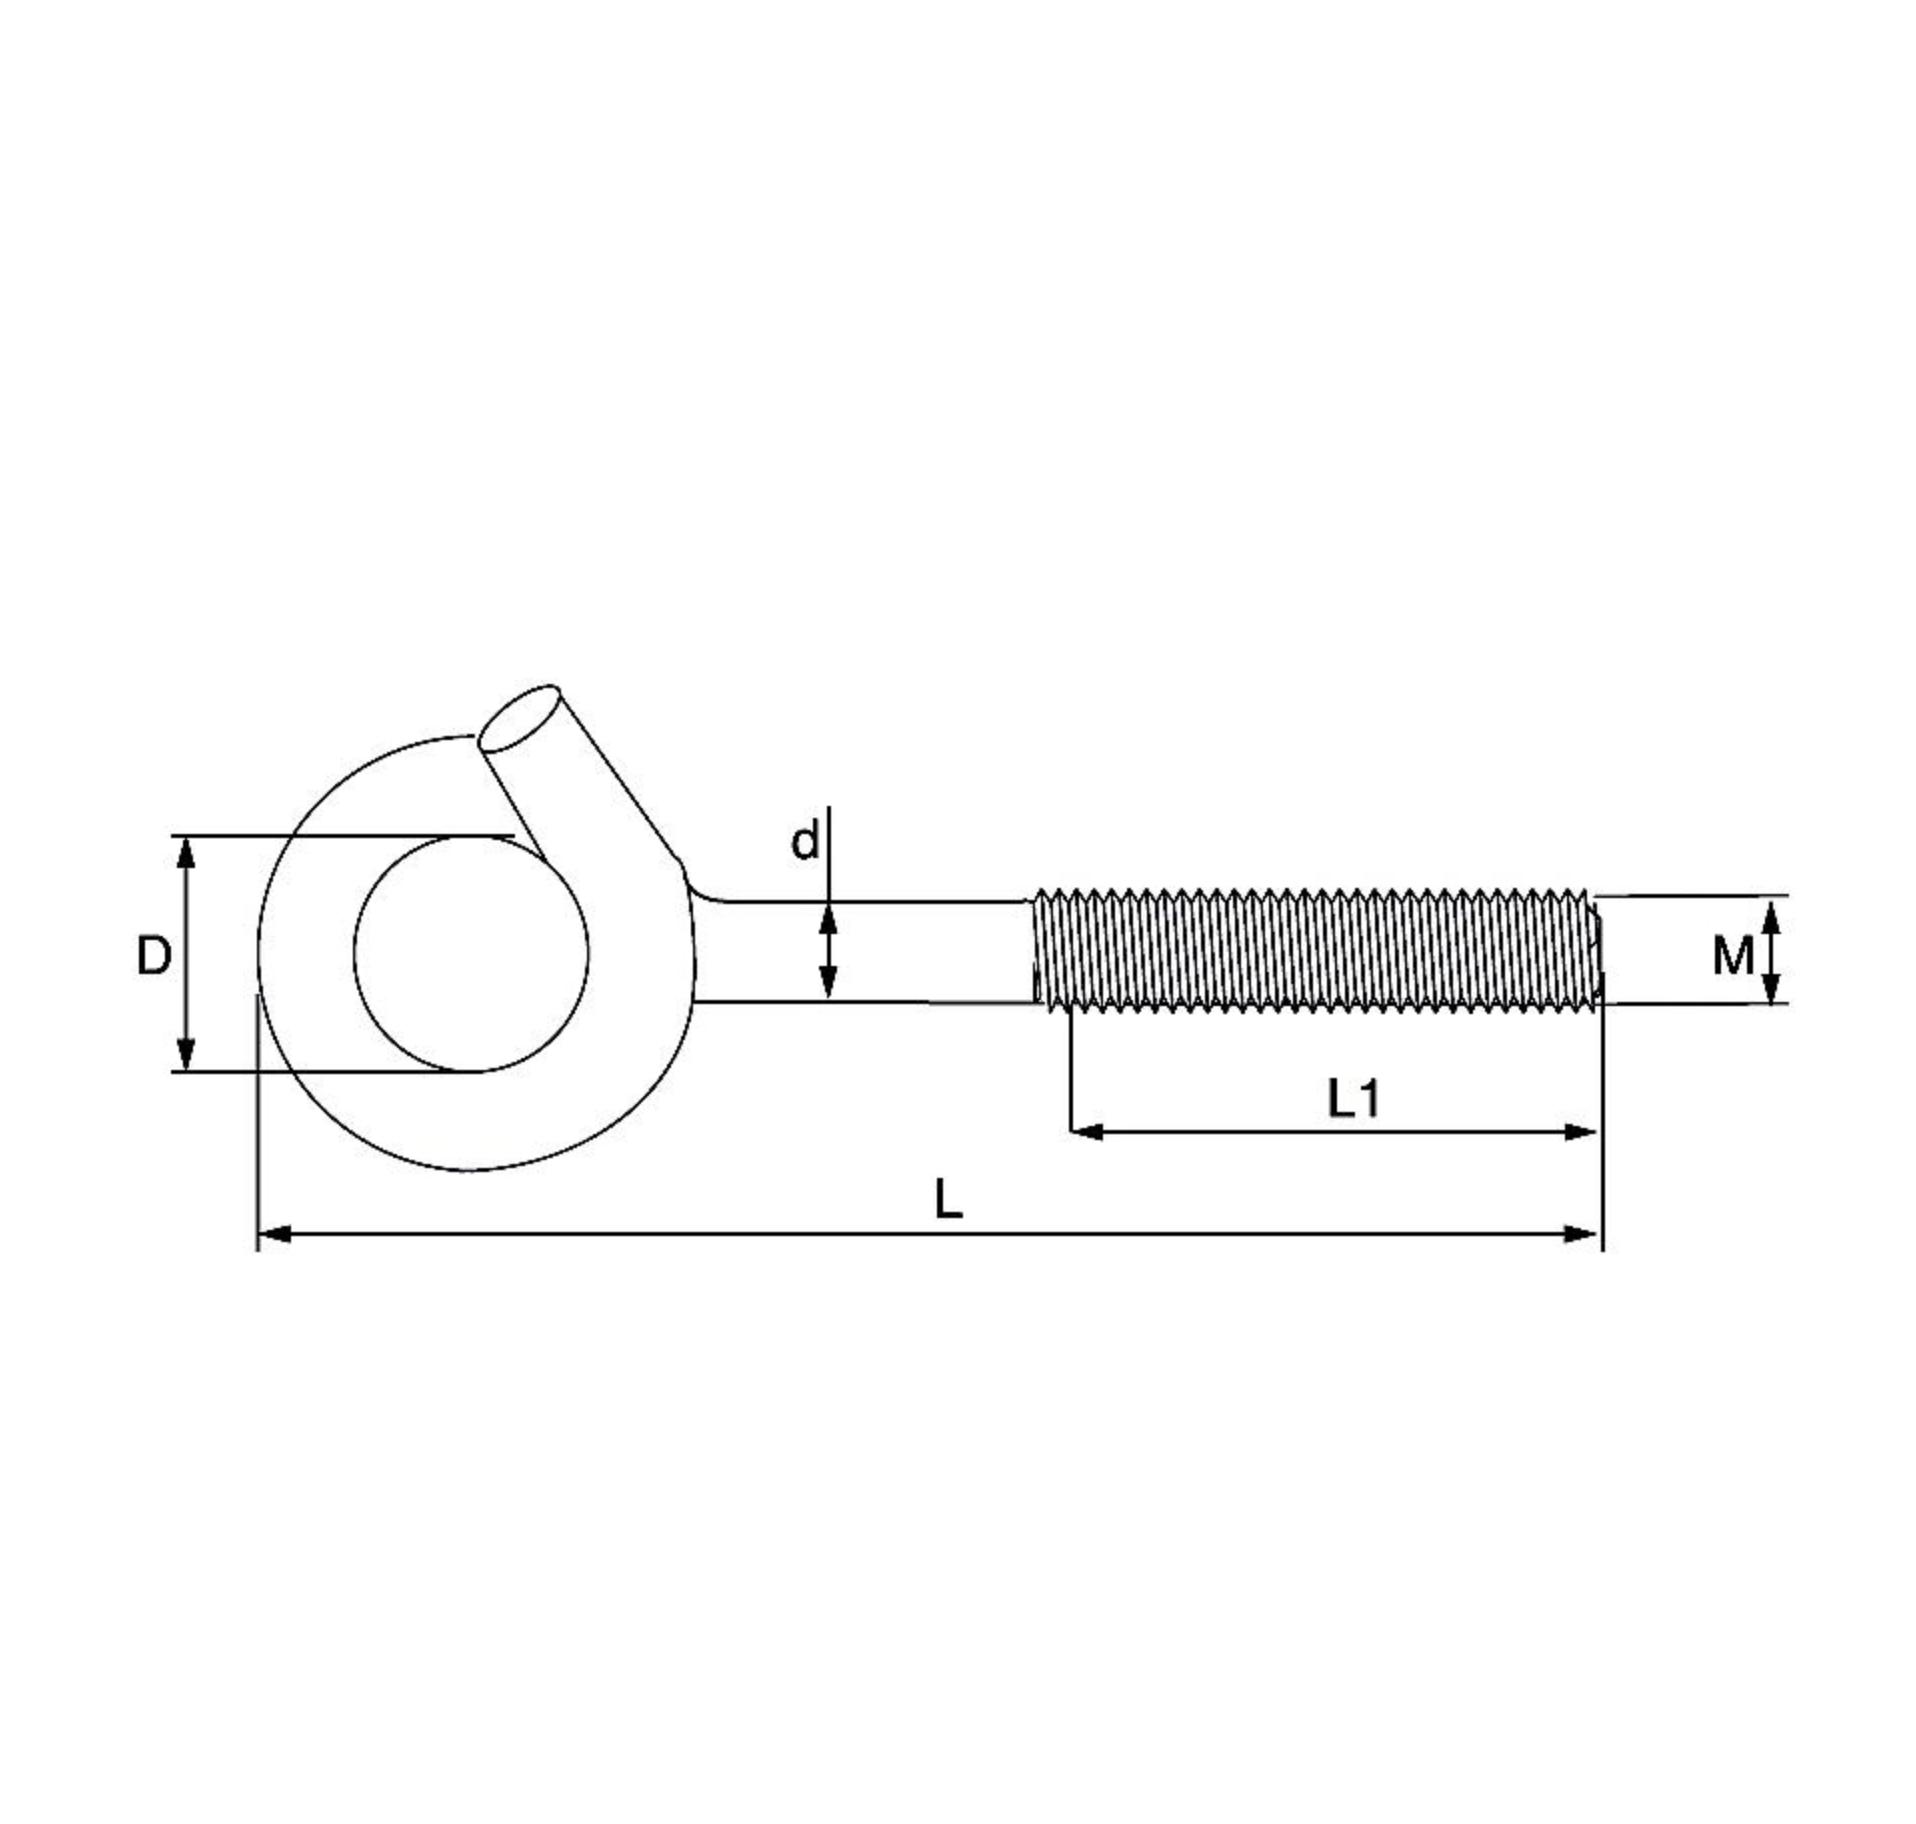 Dulimex Dulimex schommelhaak - bevestigingshaak M10x145 mm - metrische draad - verzinkt - 375-10E